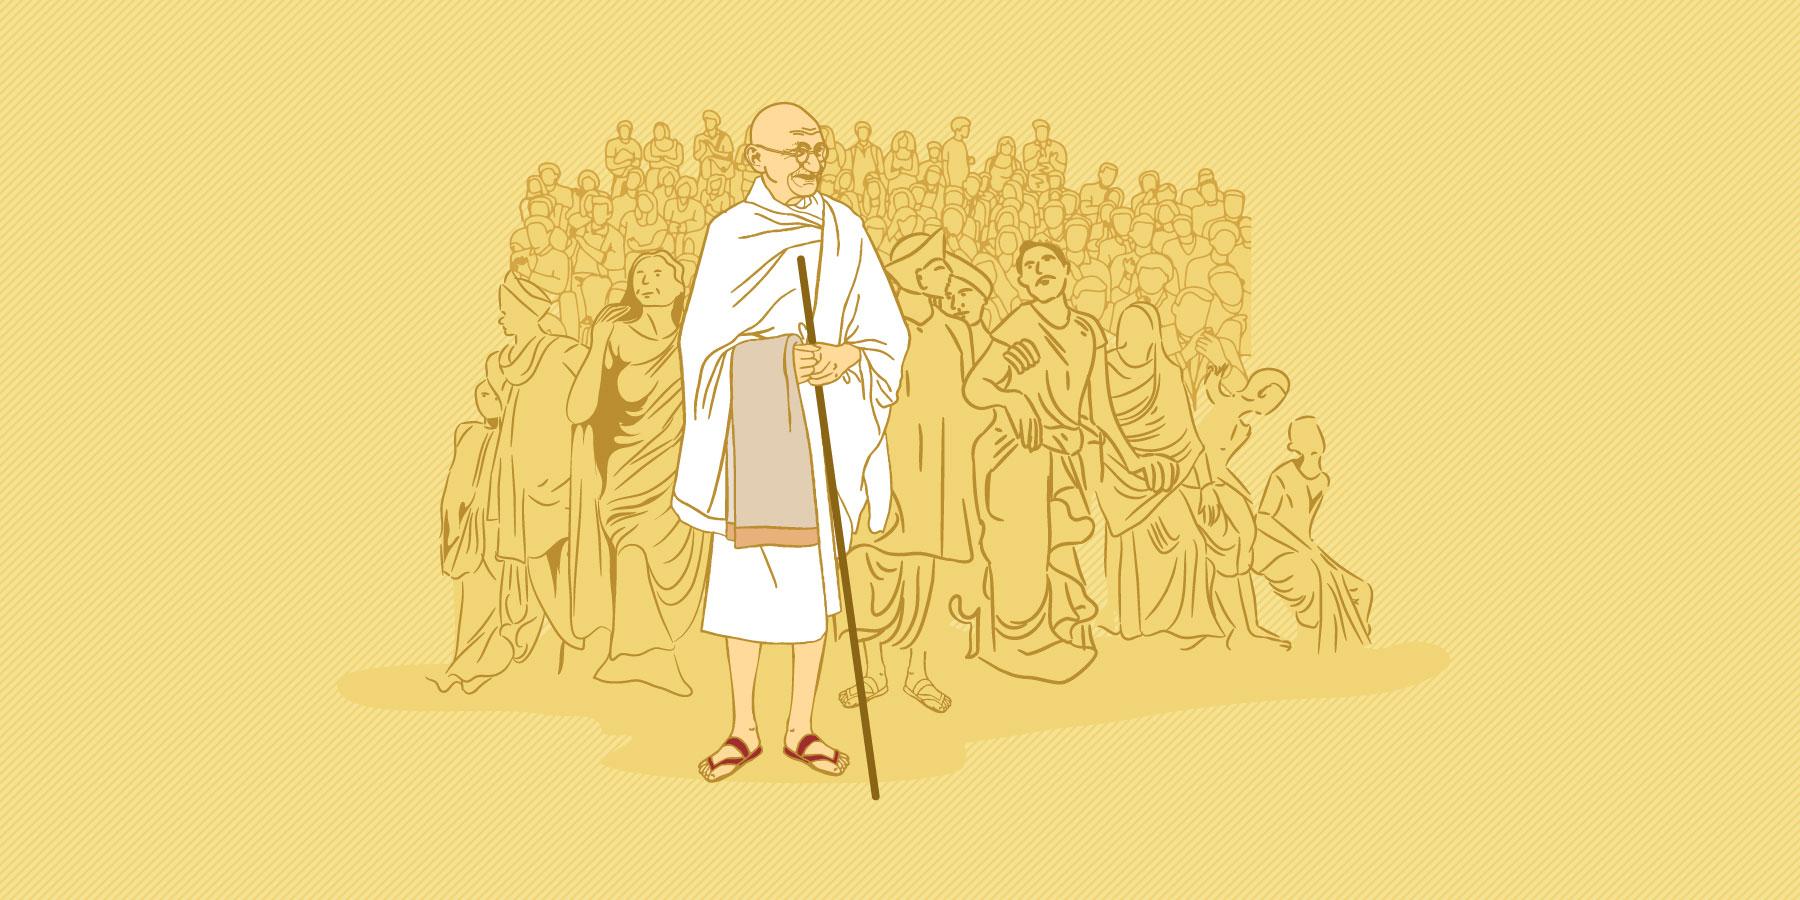 The fragrance of Gandhi's life